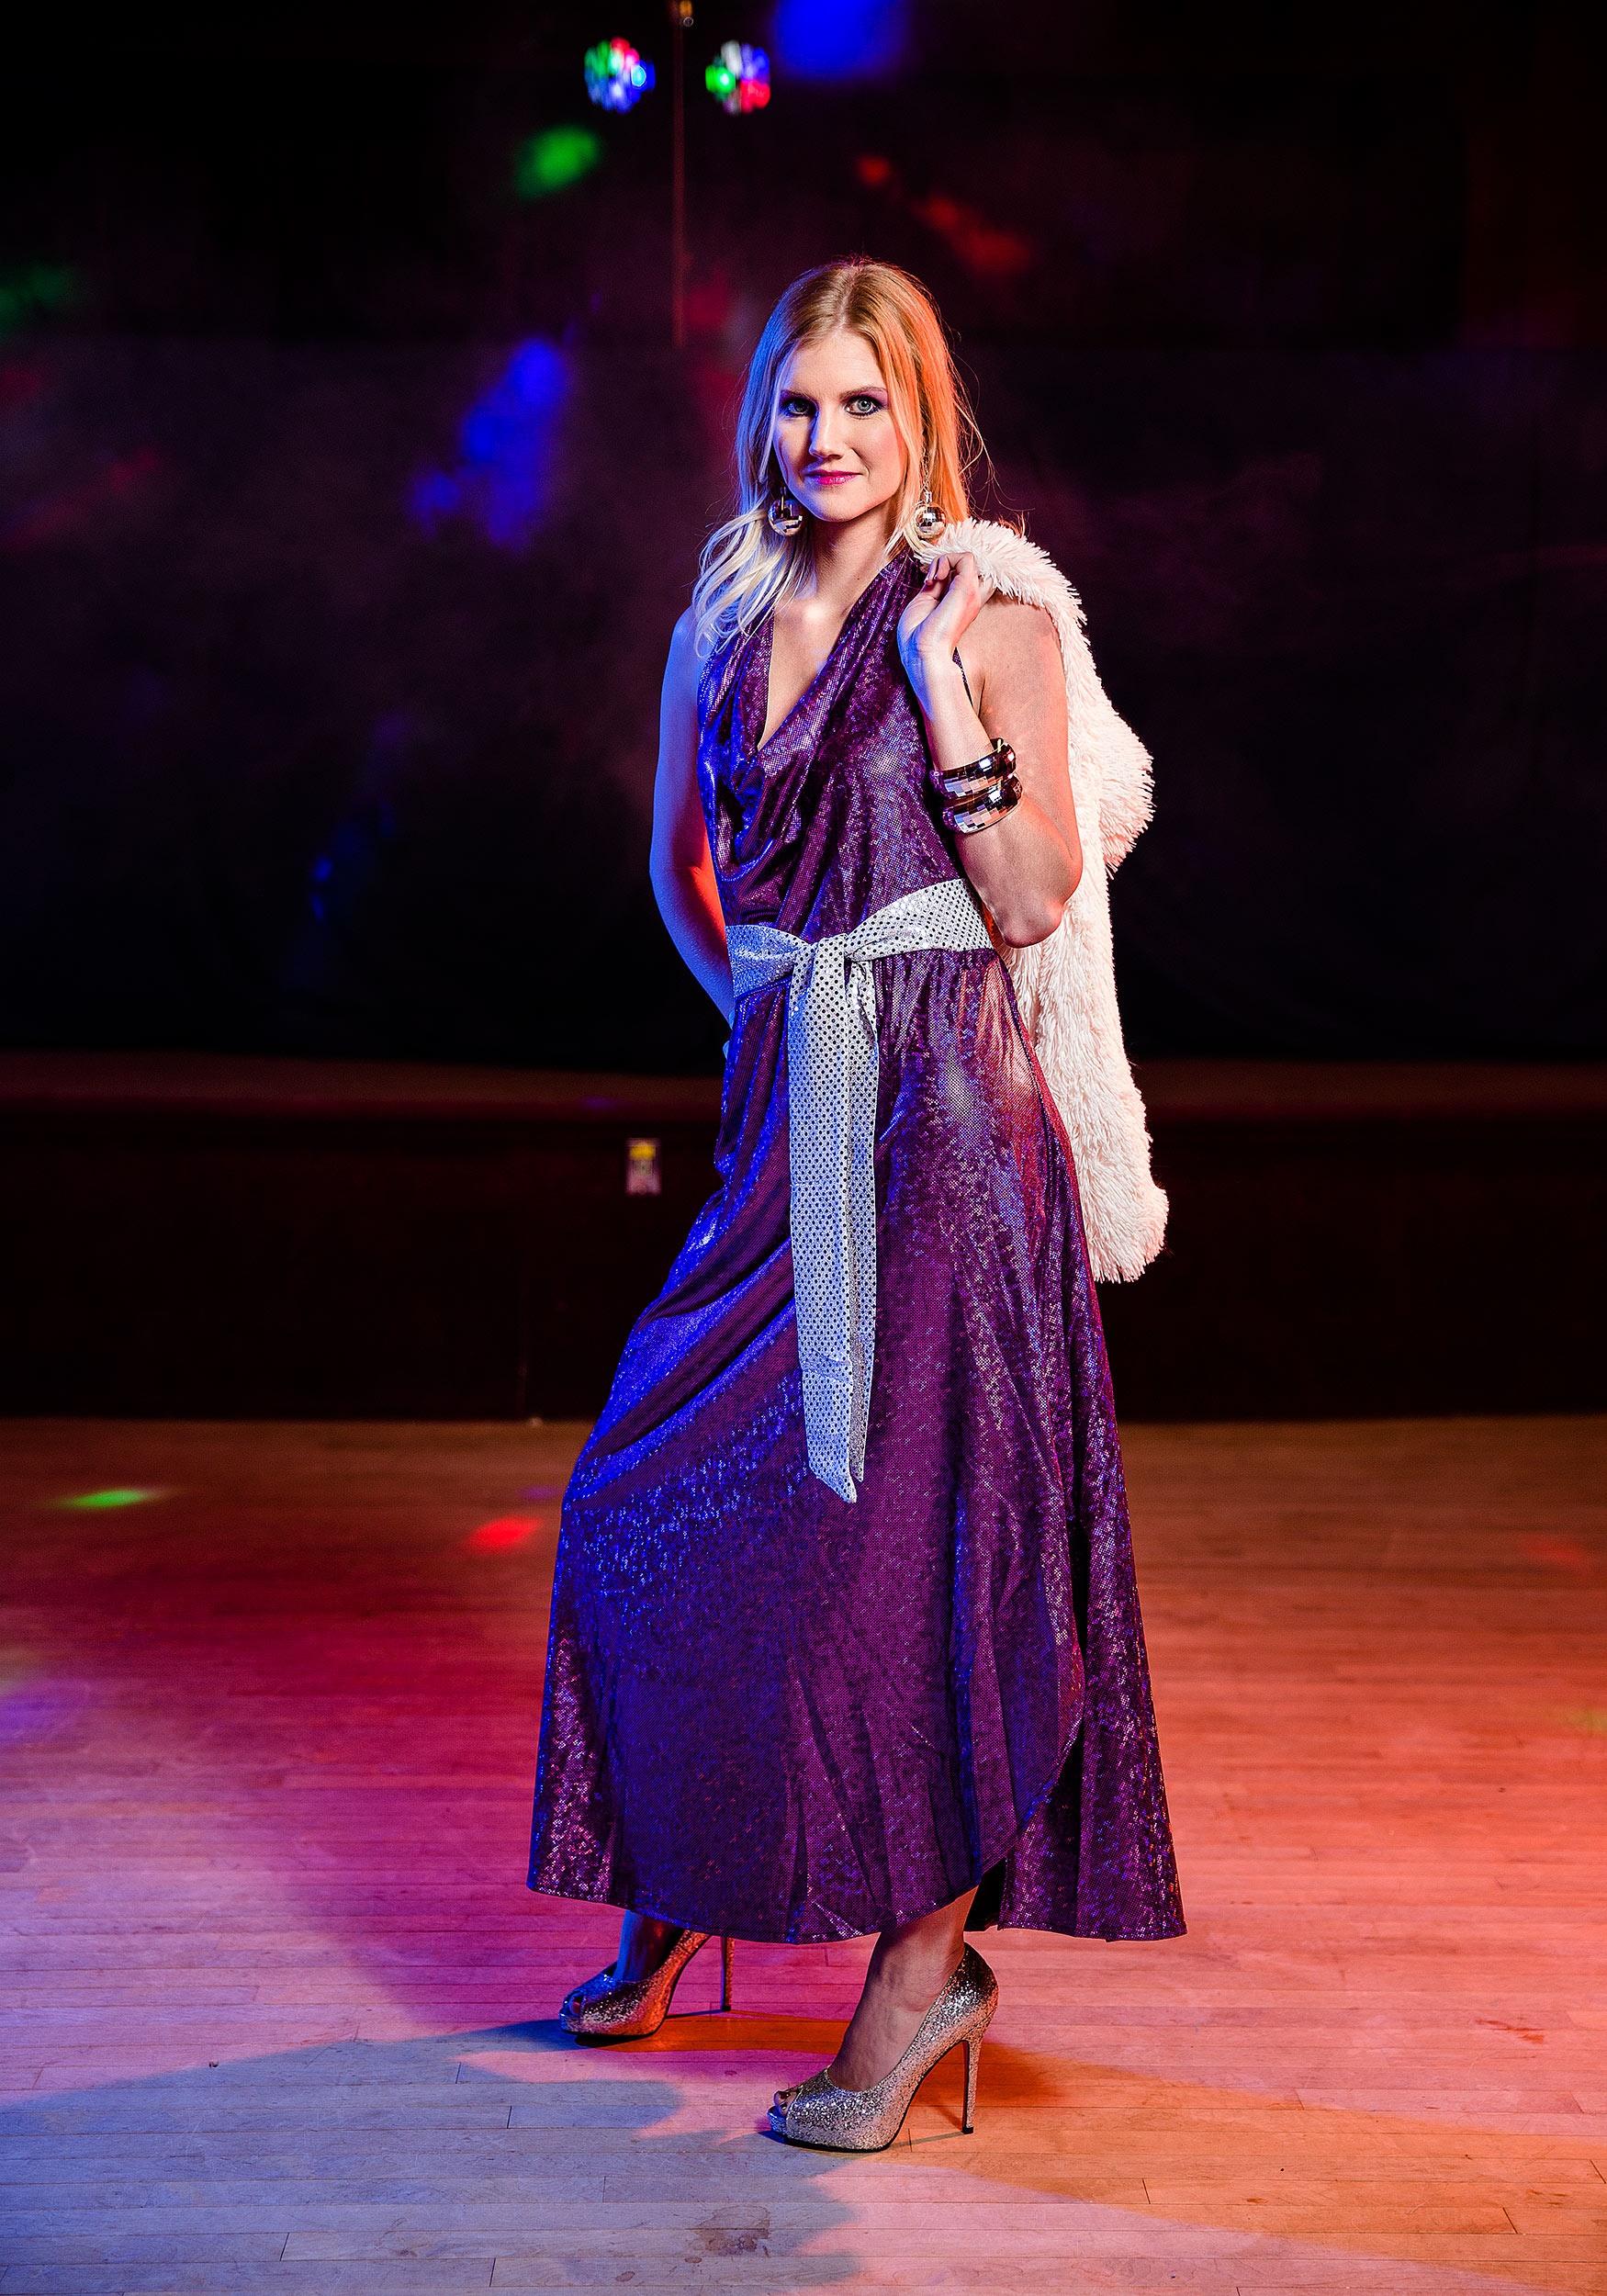 Women 39 s plus size disco ball diva costume - Discoteca diva ispra ...